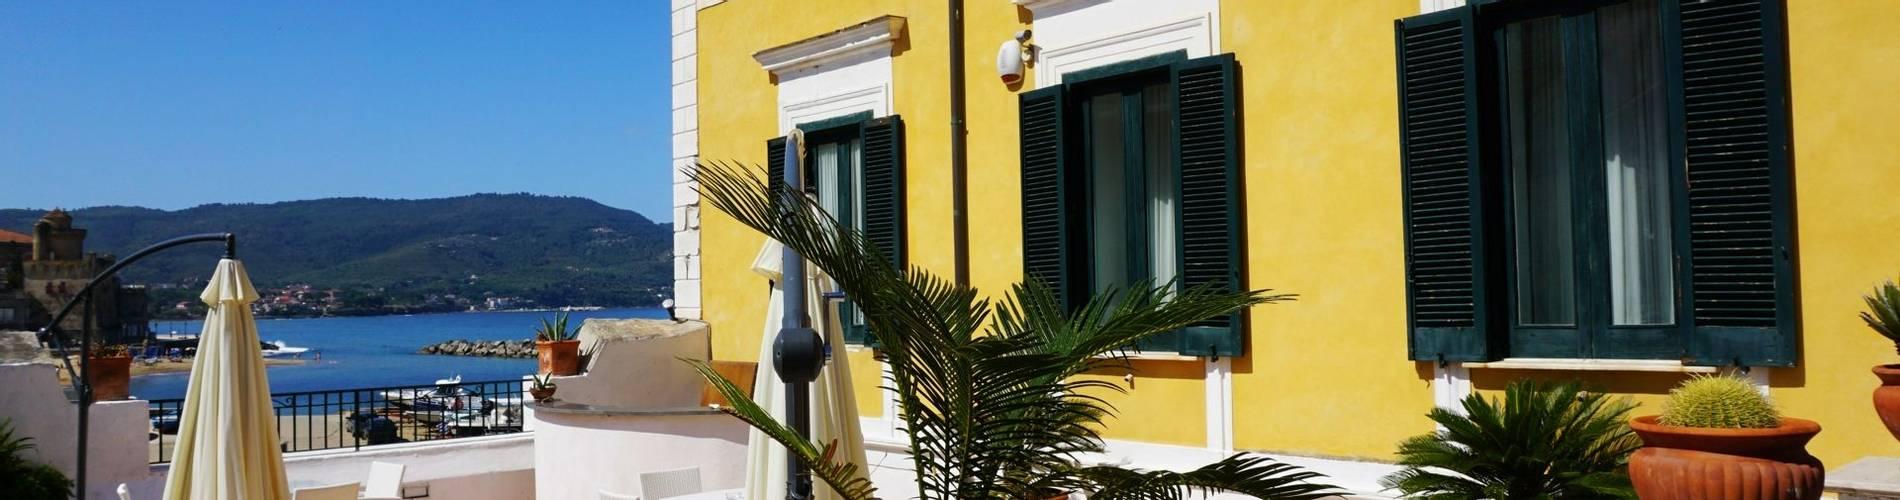 Villa Sirio, South Campania, Italy (18).jpg